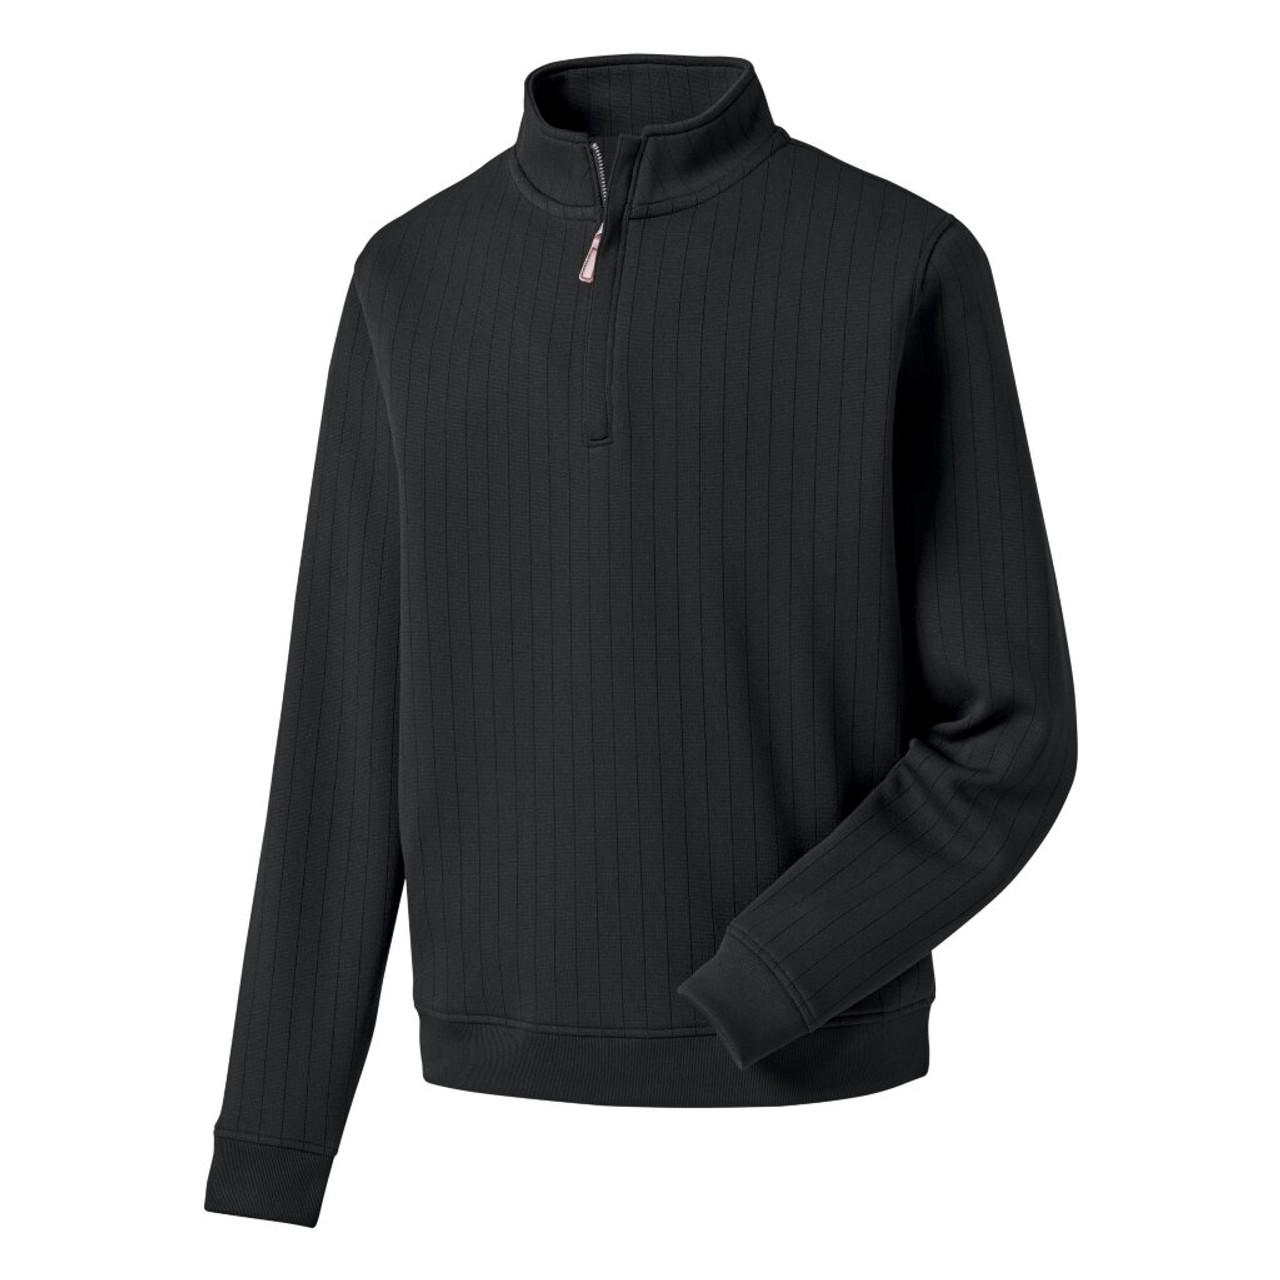 FootJoy Drop Needle Half-Zip Pullover - Black (27270)